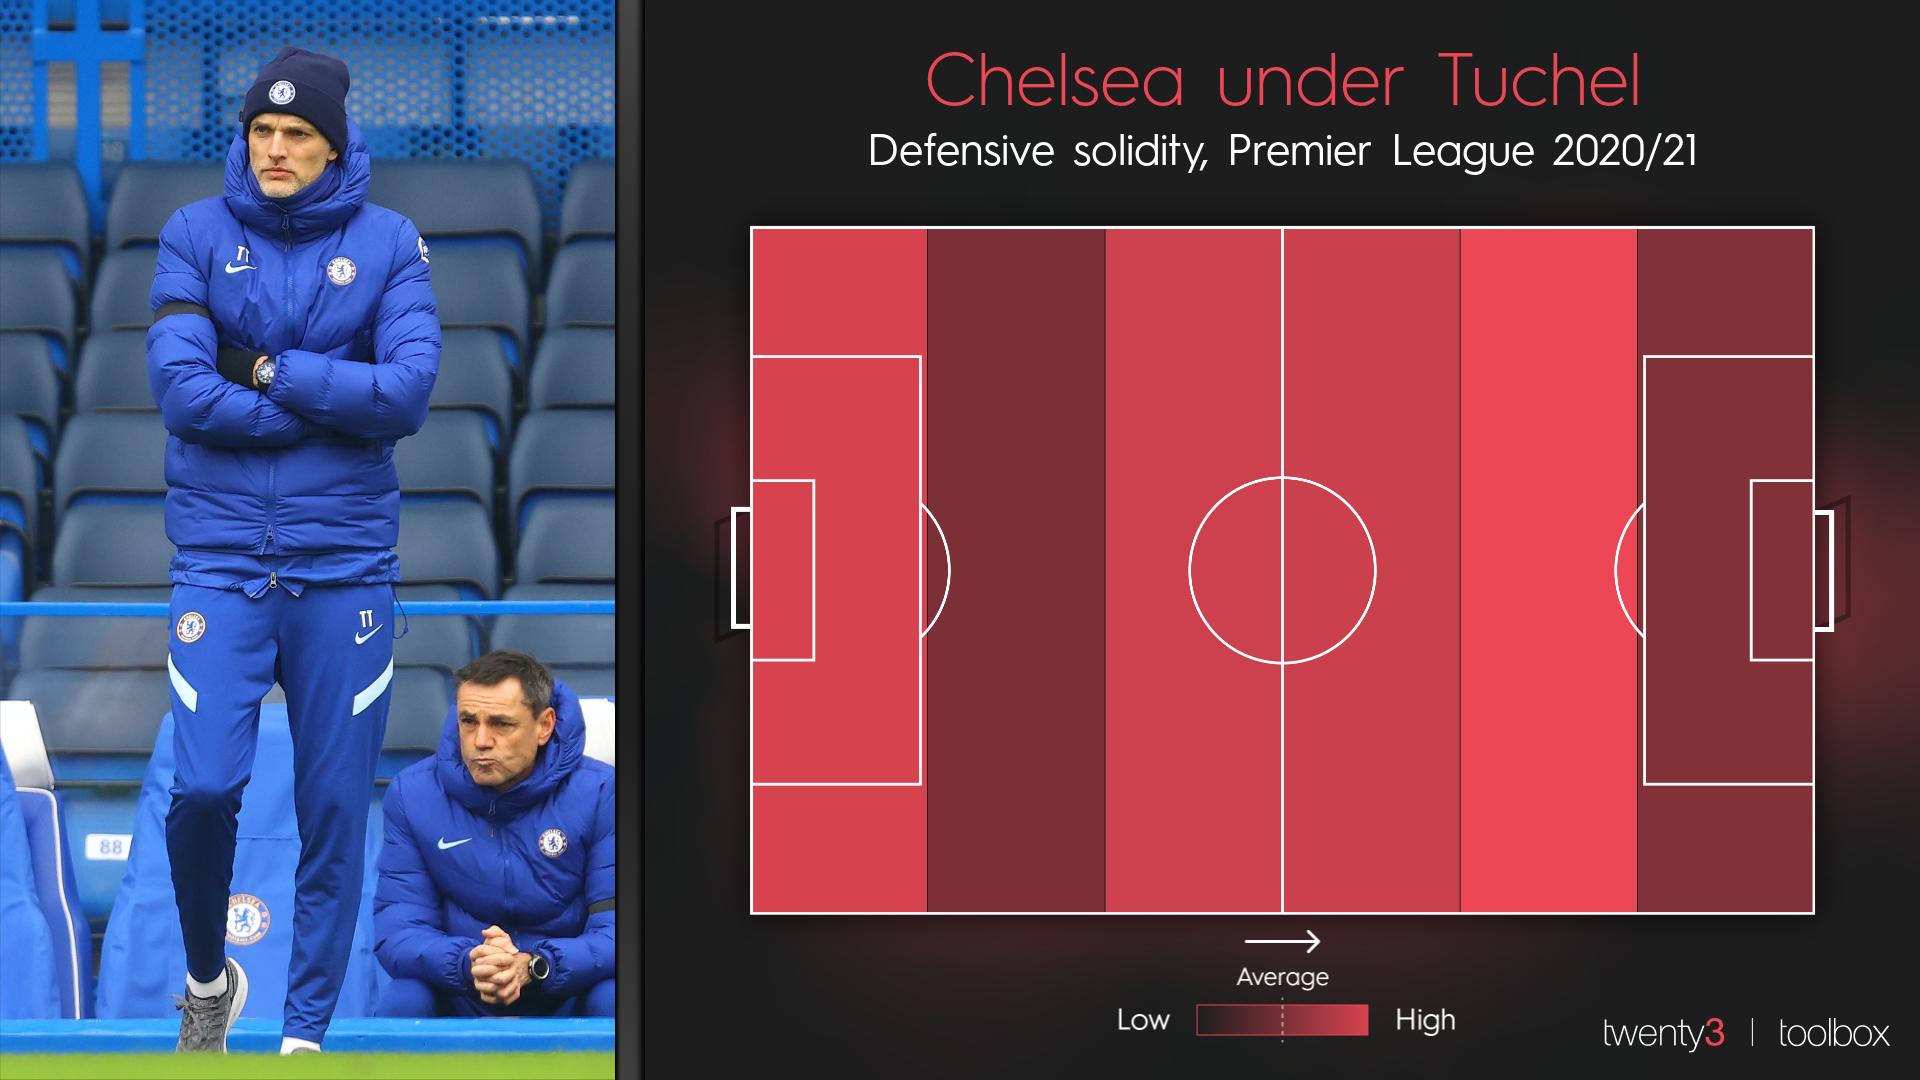 Chelsea's defensive solidity in the 2020/21 Premier League season under Thomas Tuchel